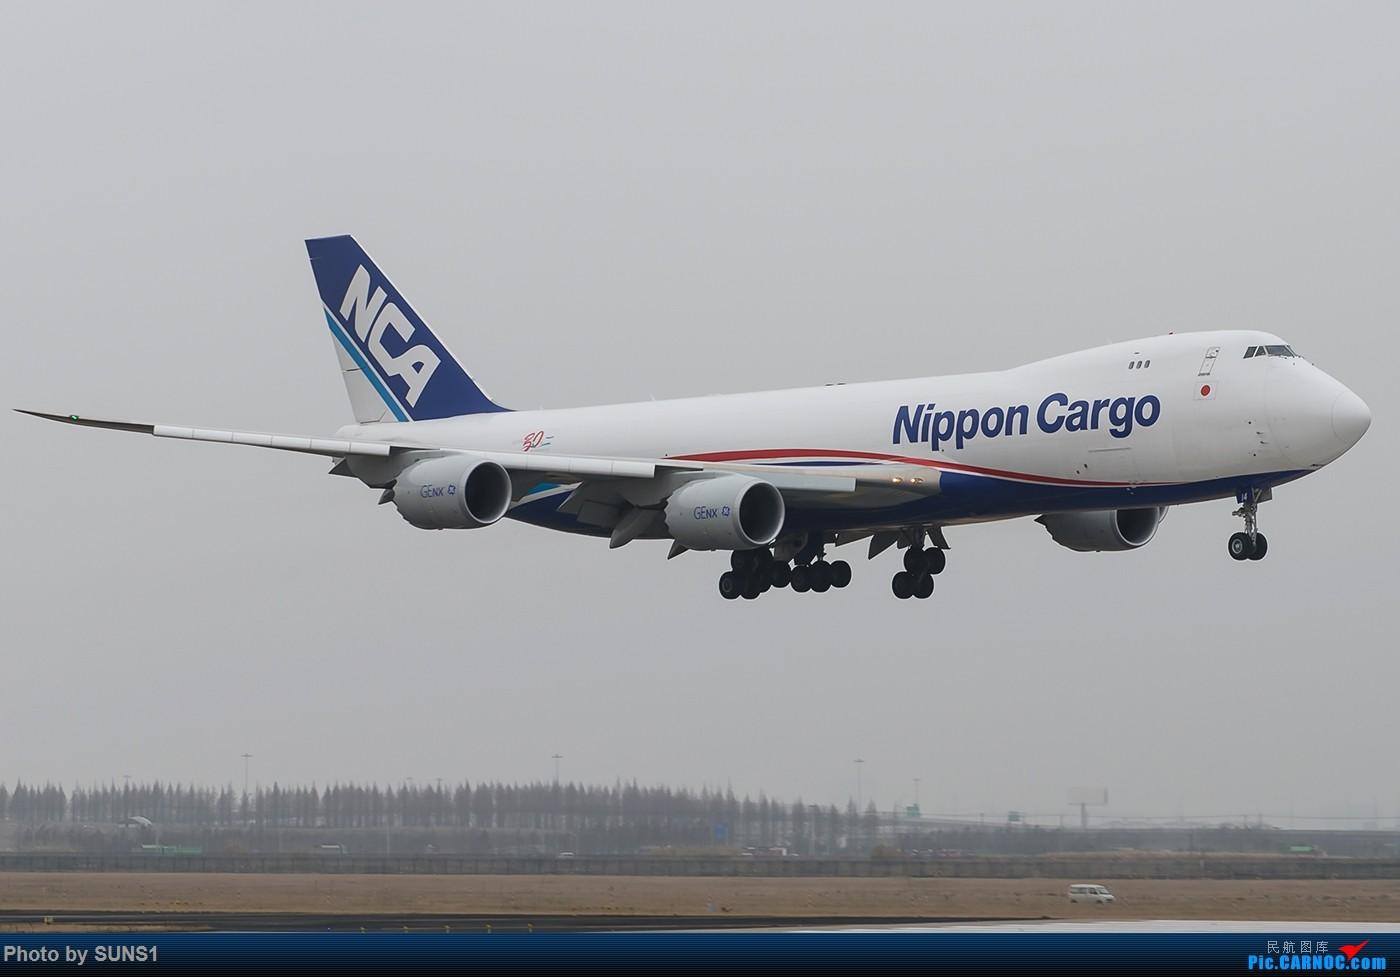 【PVG】 Nippon Cargo 日本货物航空  Boeing 747-8KZF JA14KZ 浦东水泥天落地 BOEING 747-8F JA14KZ 中国上海浦东国际机场